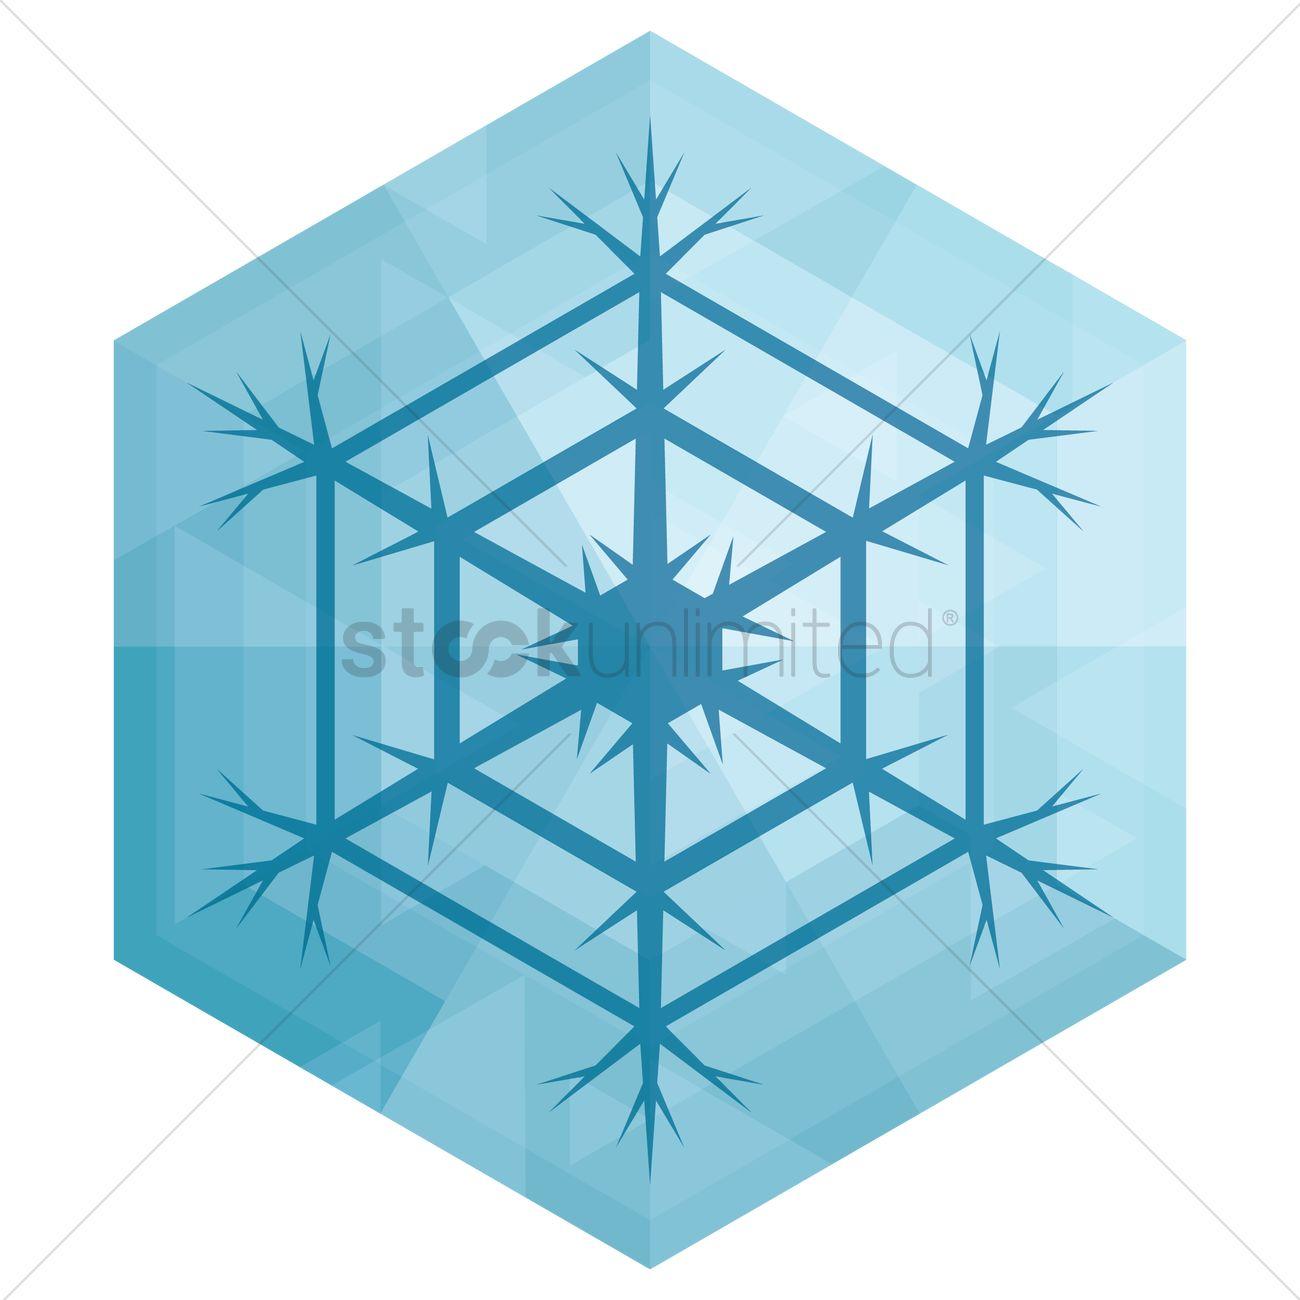 Snowflake Symbol Vector Image 1399959 Stockunlimited